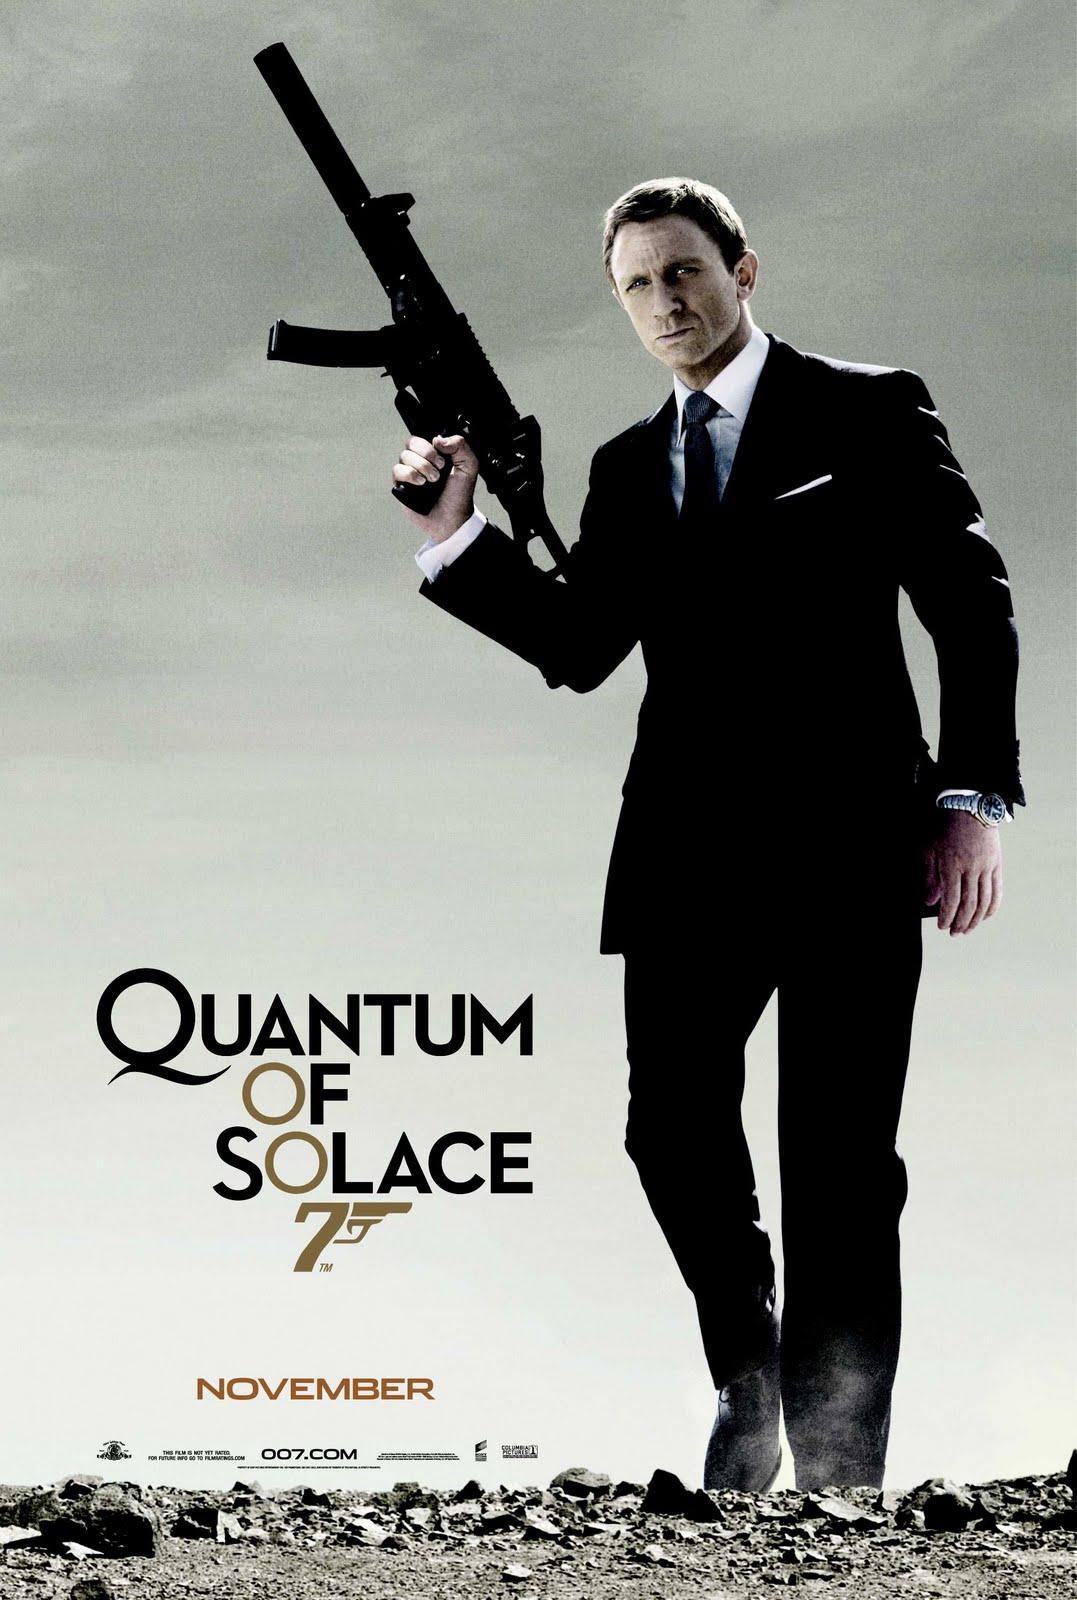 http://2.bp.blogspot.com/-ZwF48RLeGdQ/TZHNrYqlw7I/AAAAAAAAAyo/aqX0lrq8VOE/s1600/2008_quantum_of_solace_poster_002.jpg